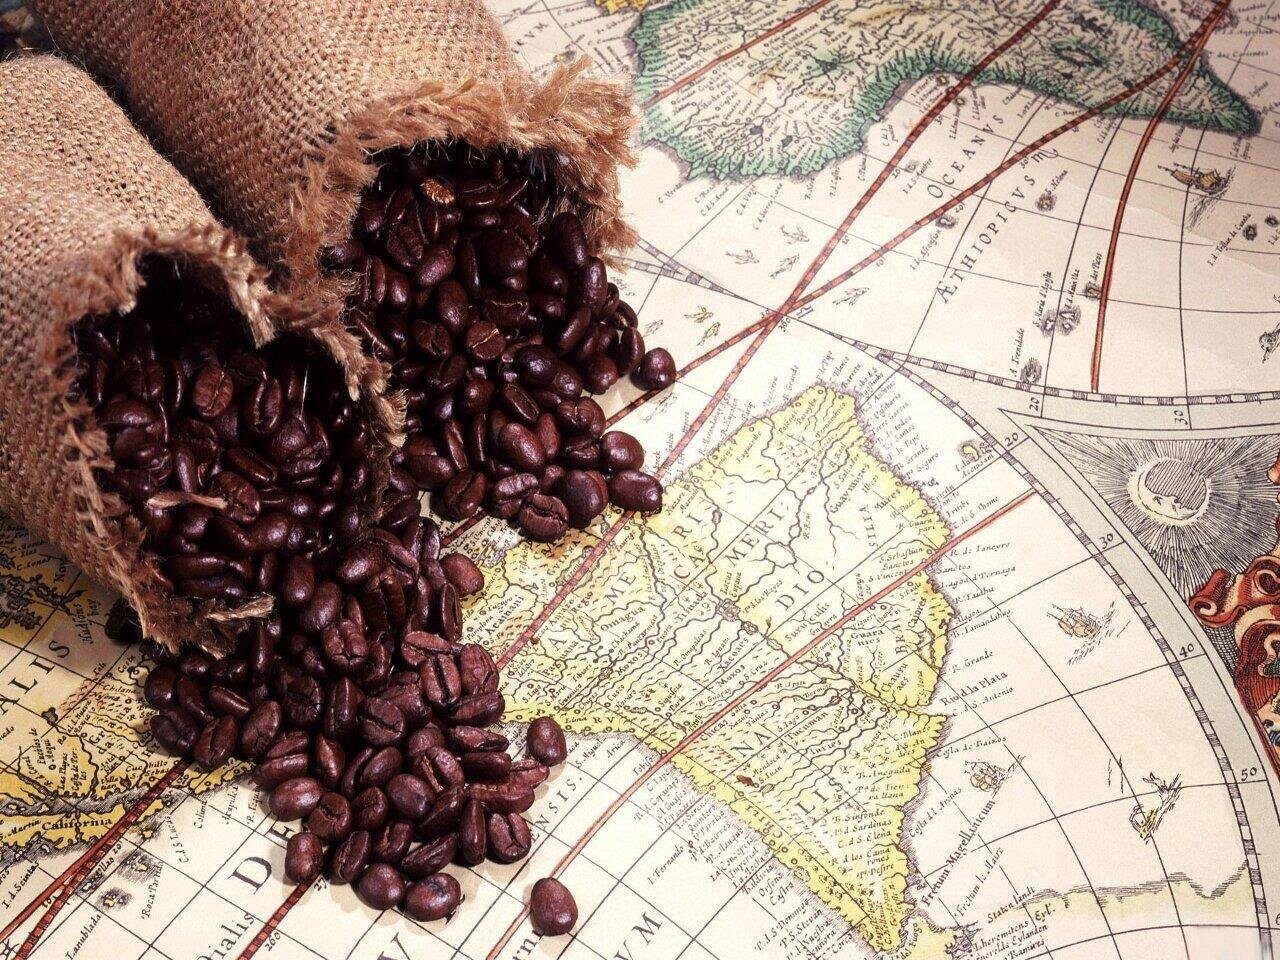 Peru Approcassi Cajamarca Fair Trade Shade Grown Organic Coffee Beans (Medium Roast (Full City +), 15 Pounds Whole Beans) by RhoadsRoast Coffees (Image #9)